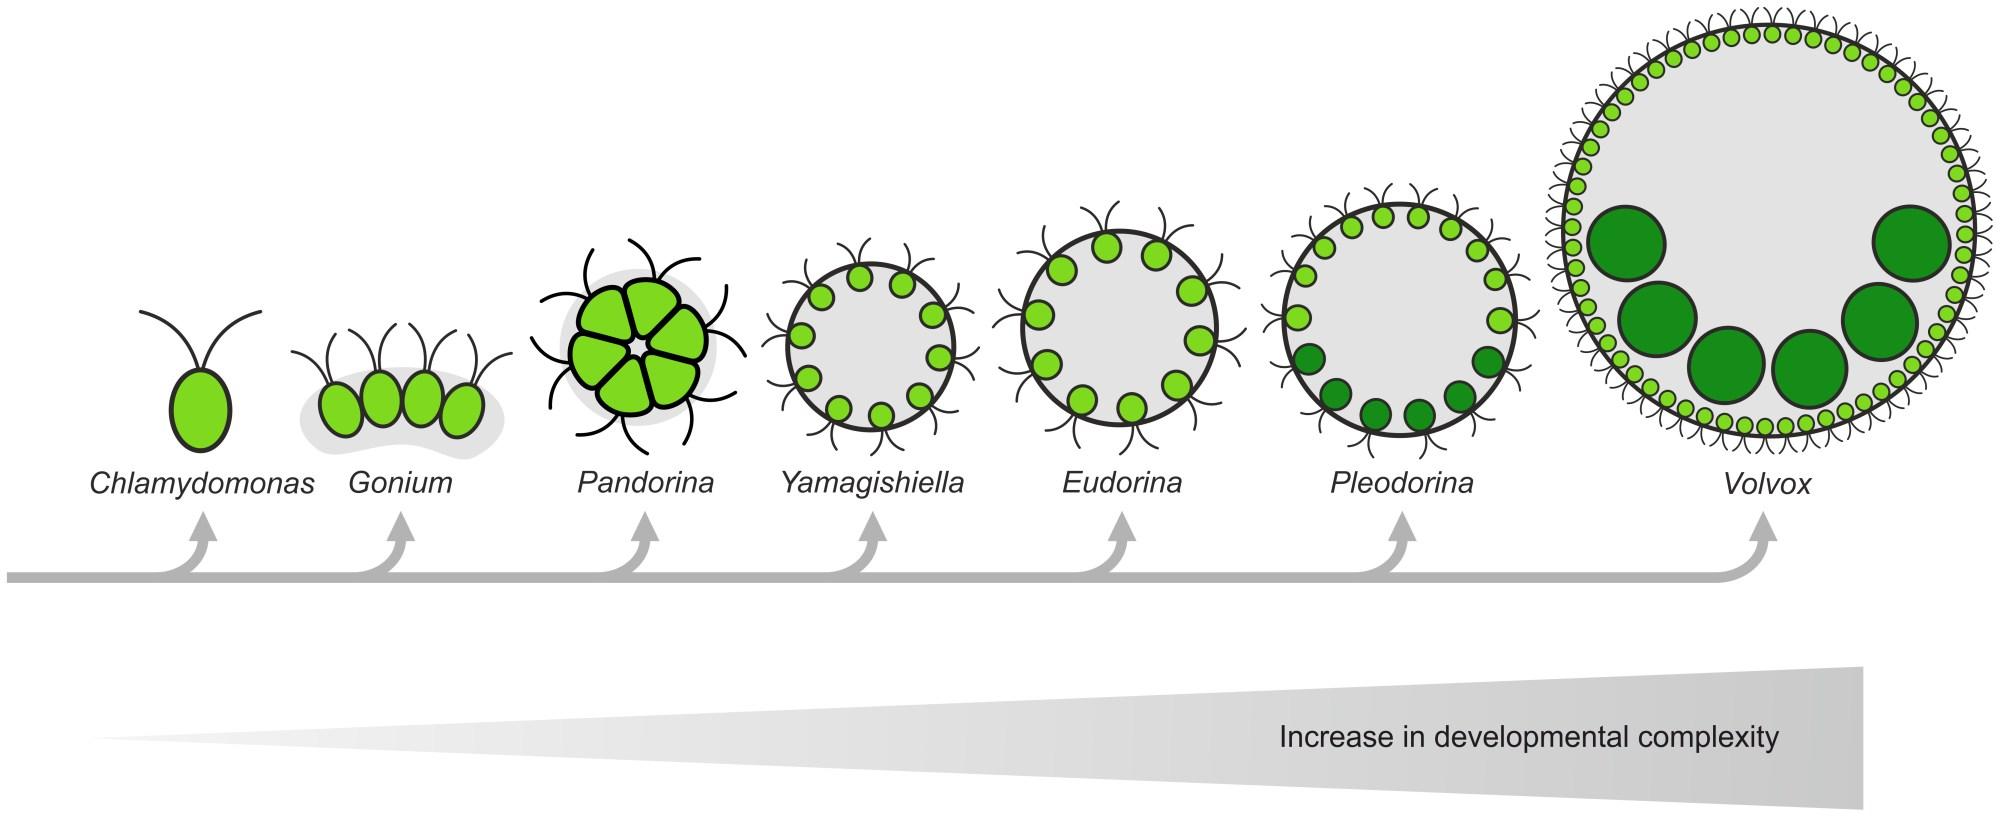 hight resolution of rough approximation of the evolution of volvocine green algae